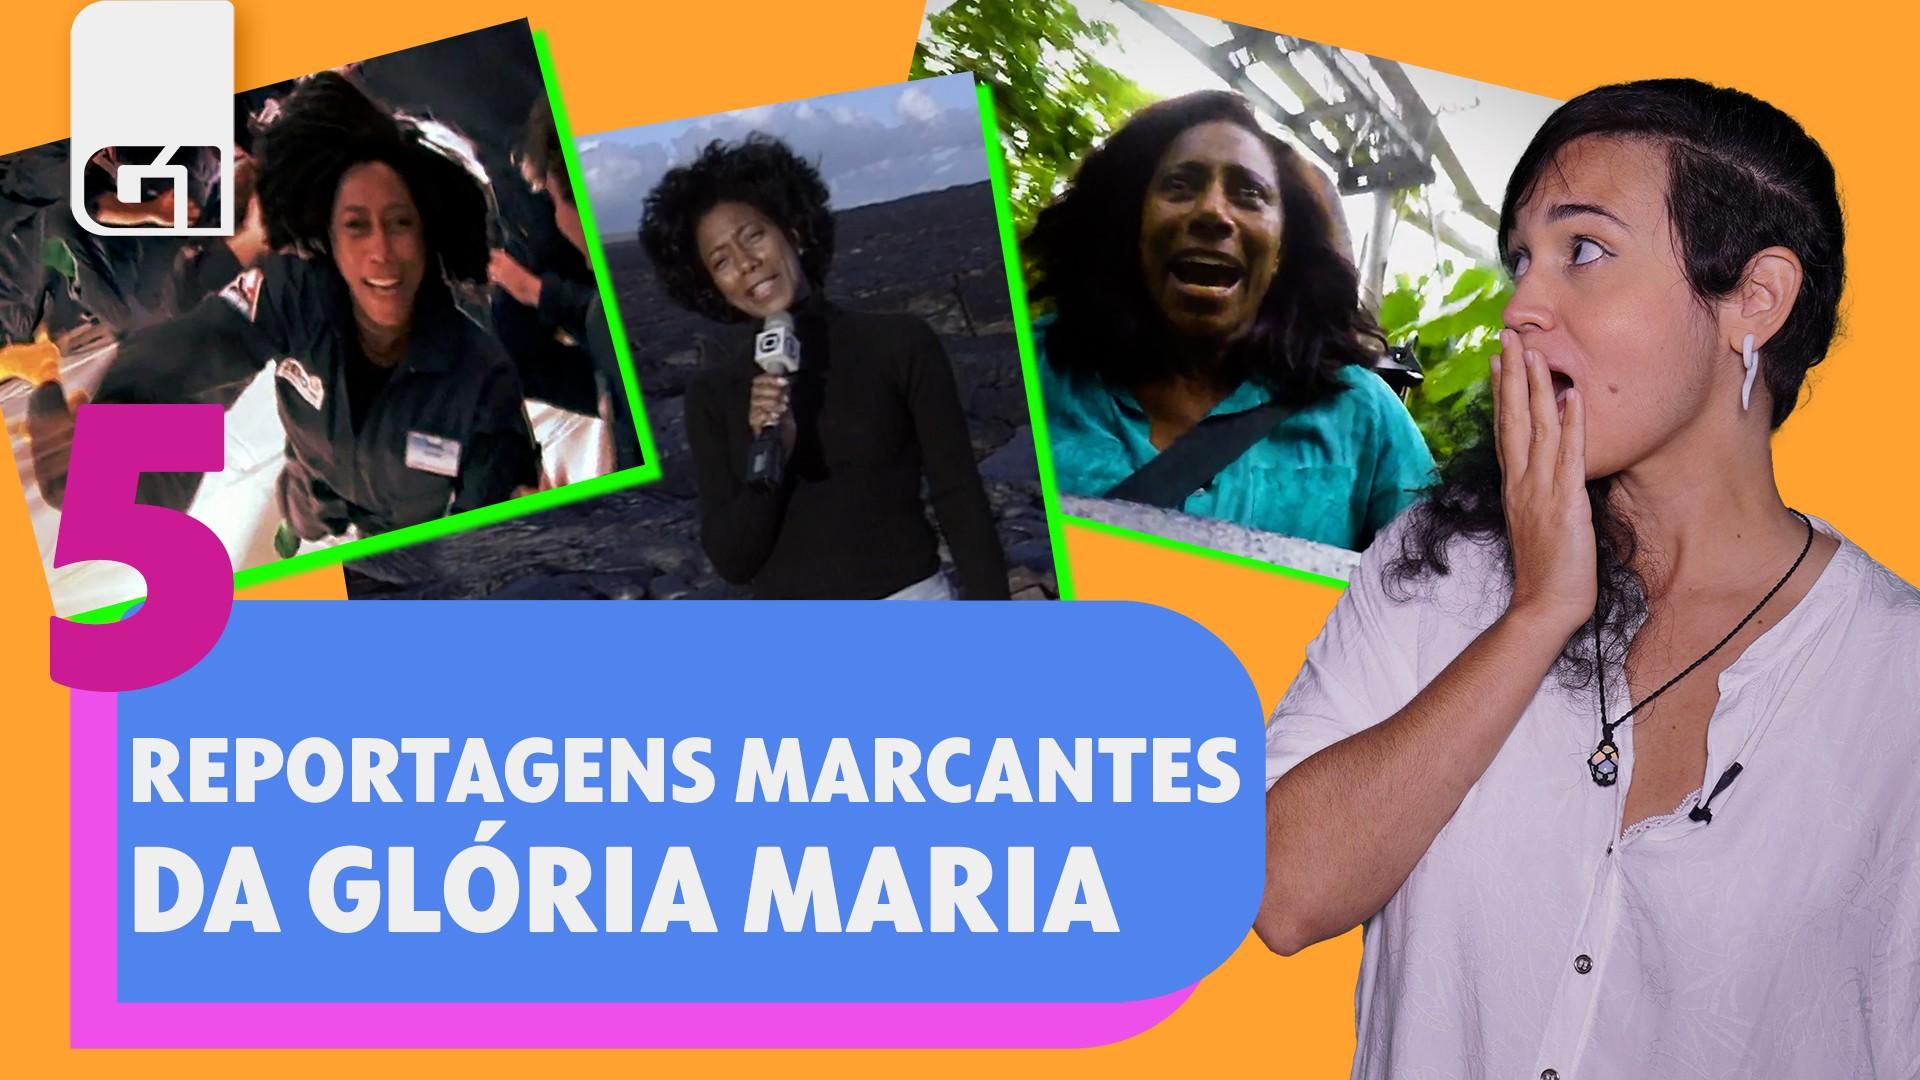 #TopTBT - 5 reportagens marcantes de Glória Maria